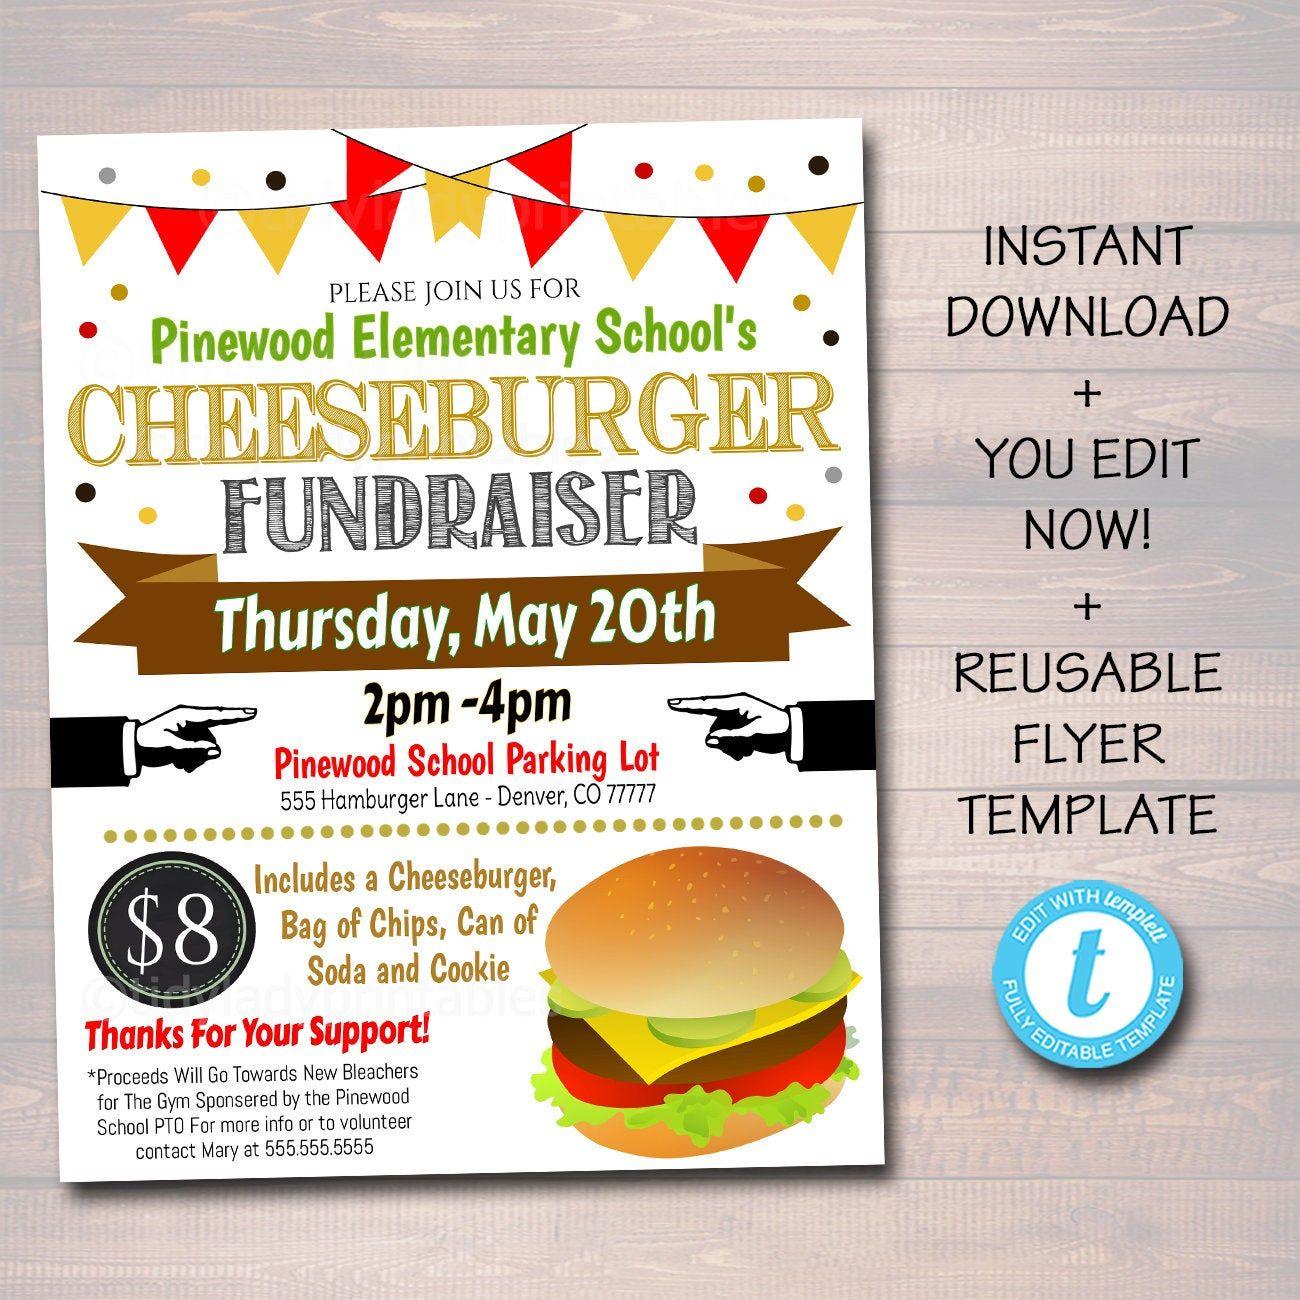 Editable Hamburger Fundraiser Flyer Printable Pta Pto Etsy In 2021 Fundraiser Flyer Fundraising Flyer Flyers for fundraisers template free